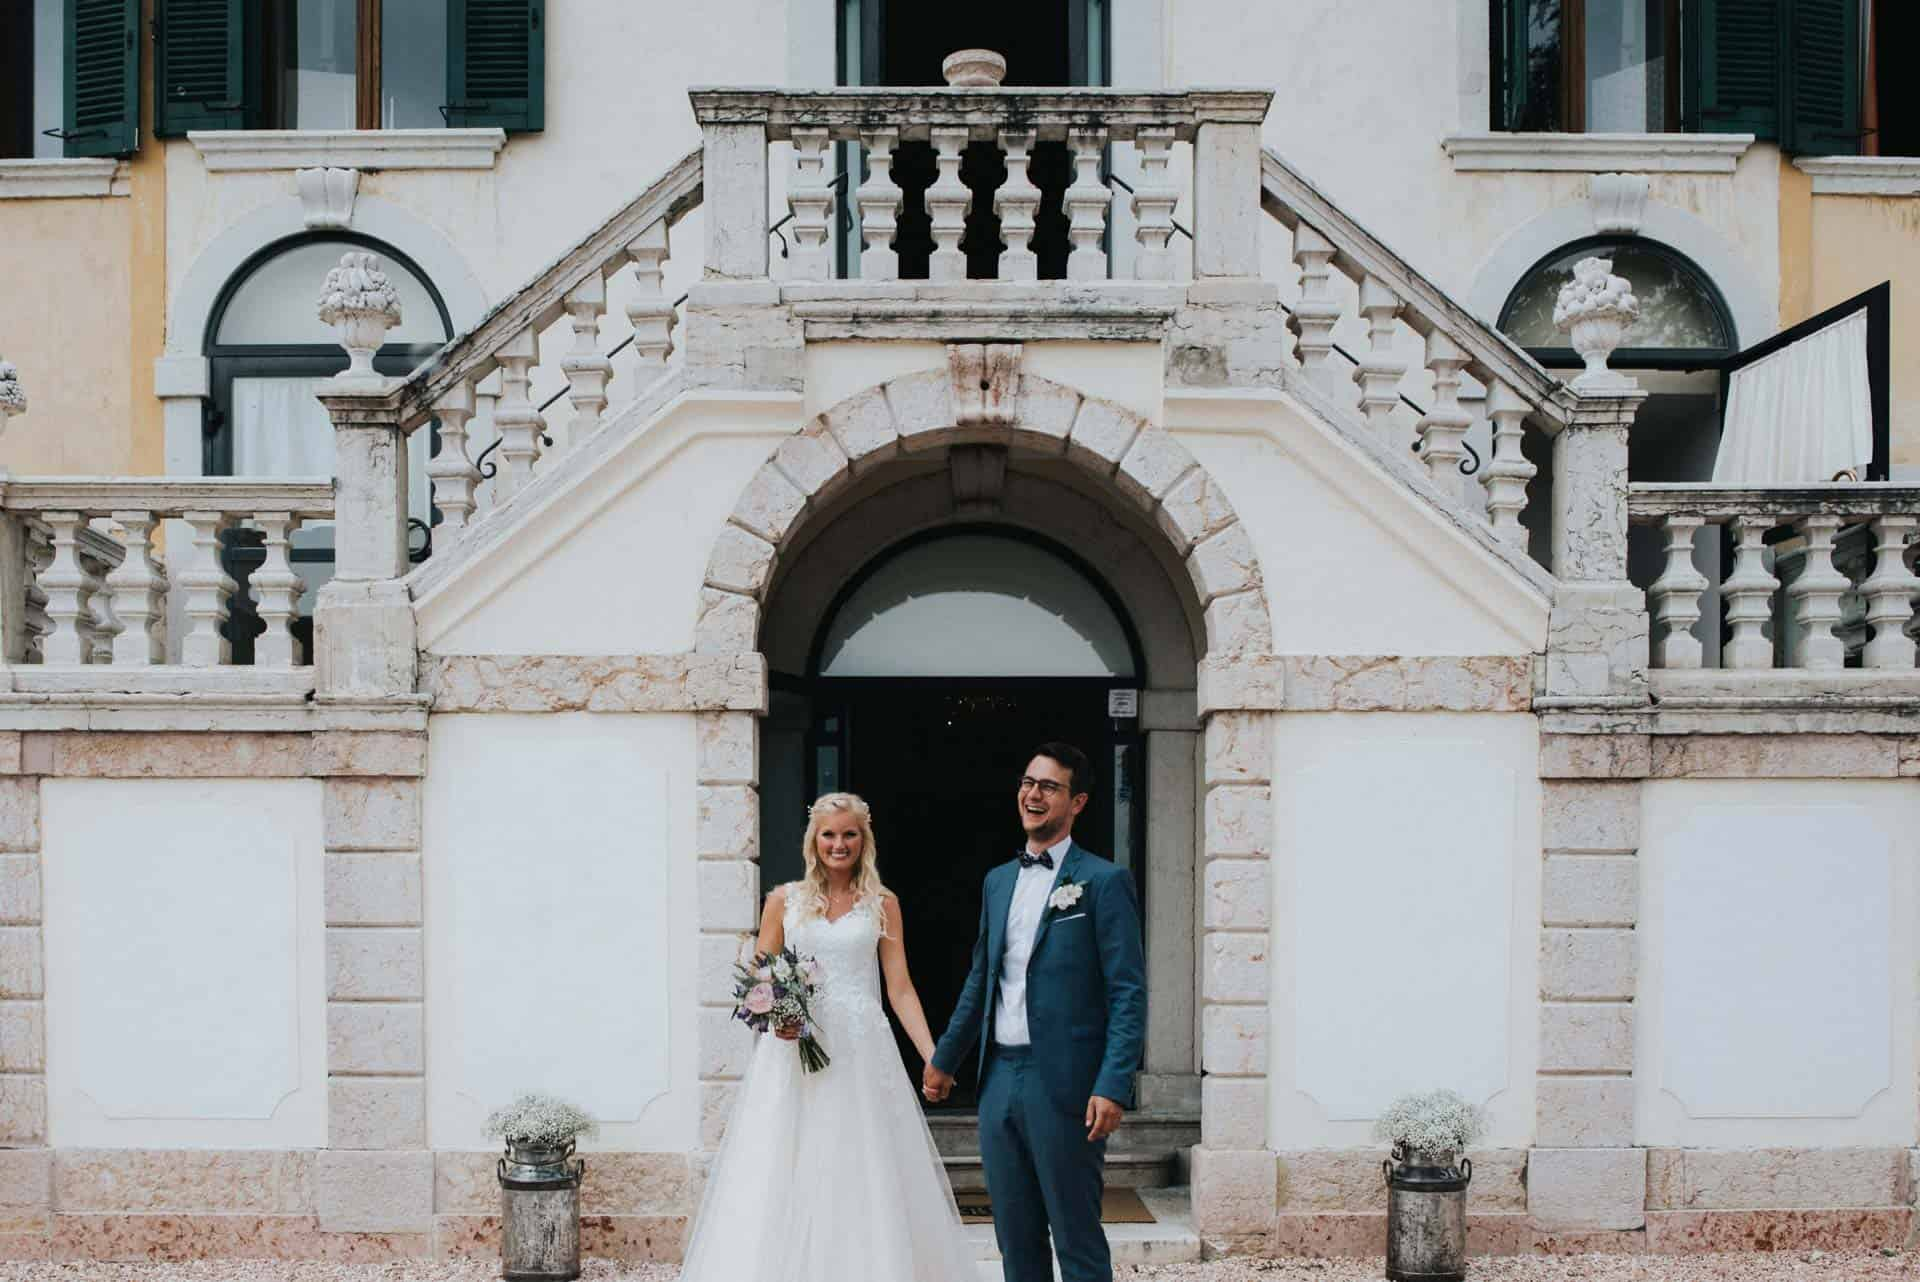 Fotografo Matrimonio Verona Villa Cariola 2 Fotografo Matrimonio Andrea Fusaro